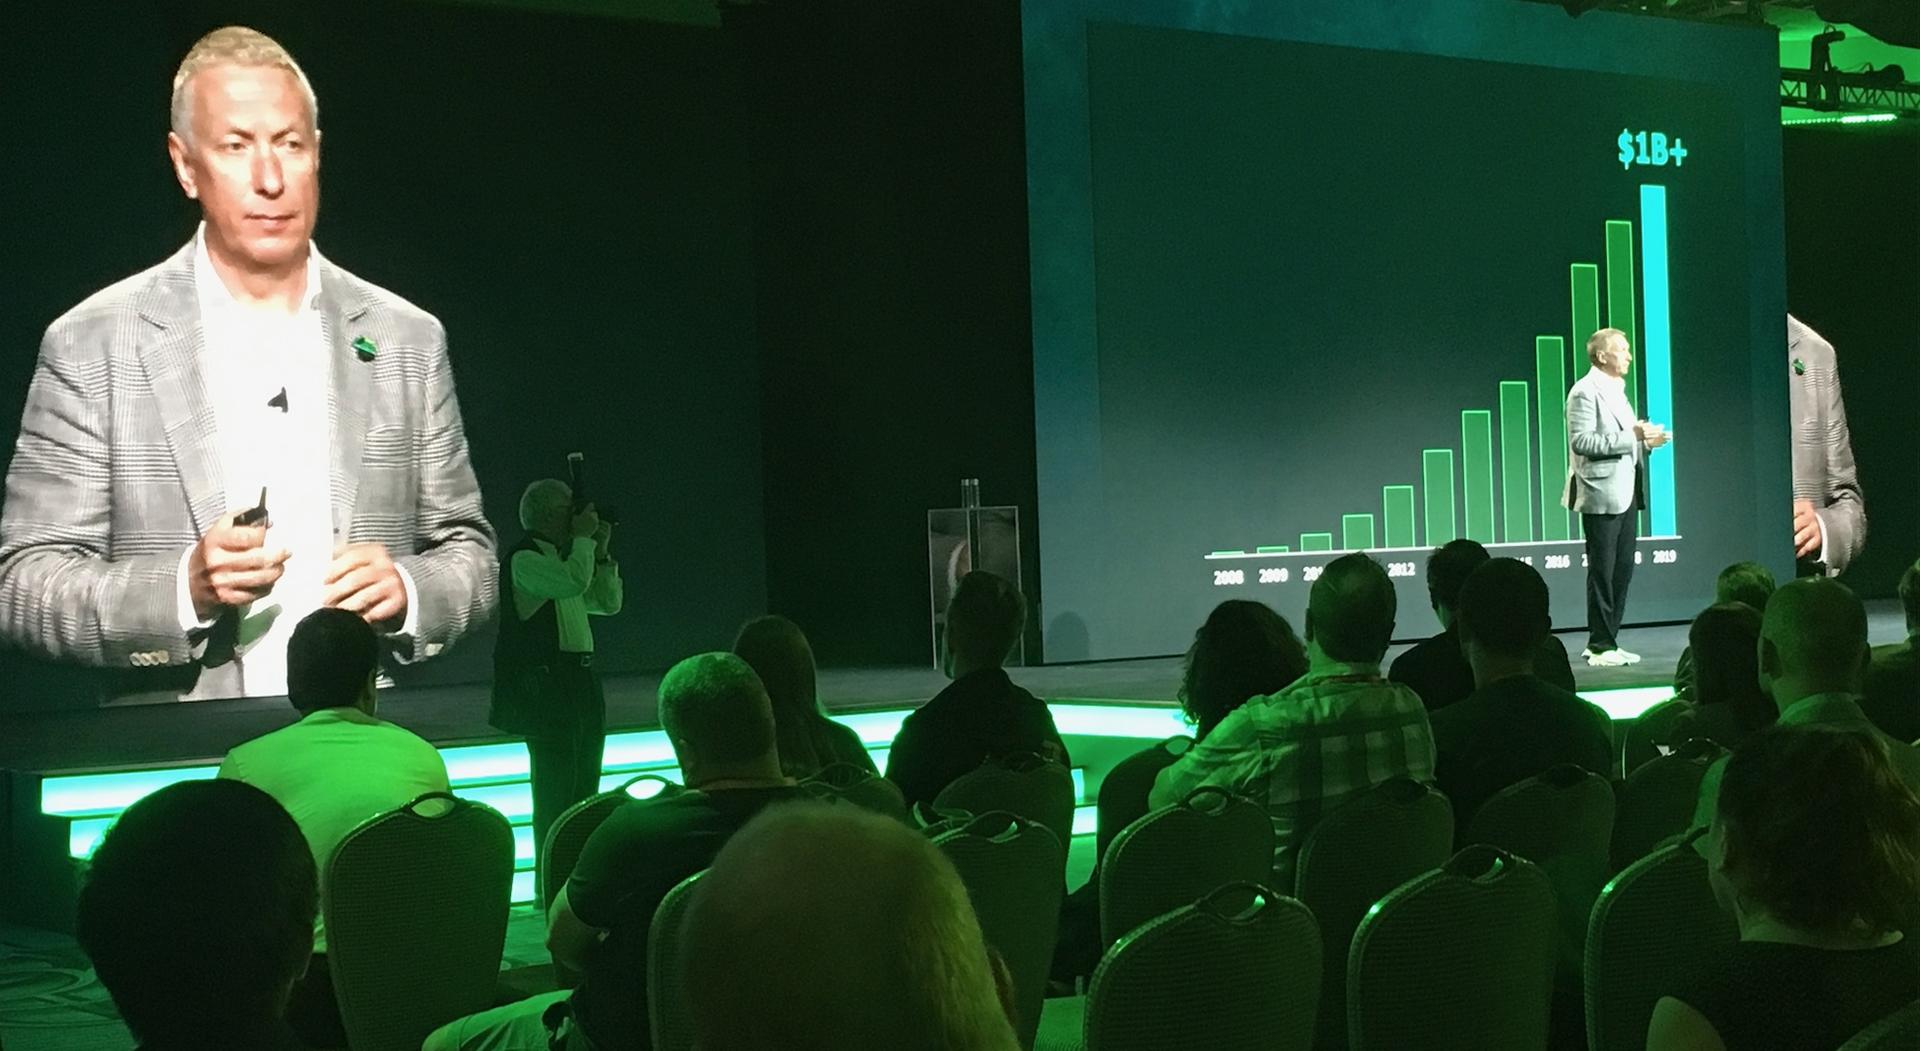 VeeamOn 2019, spinta sul cloud data management